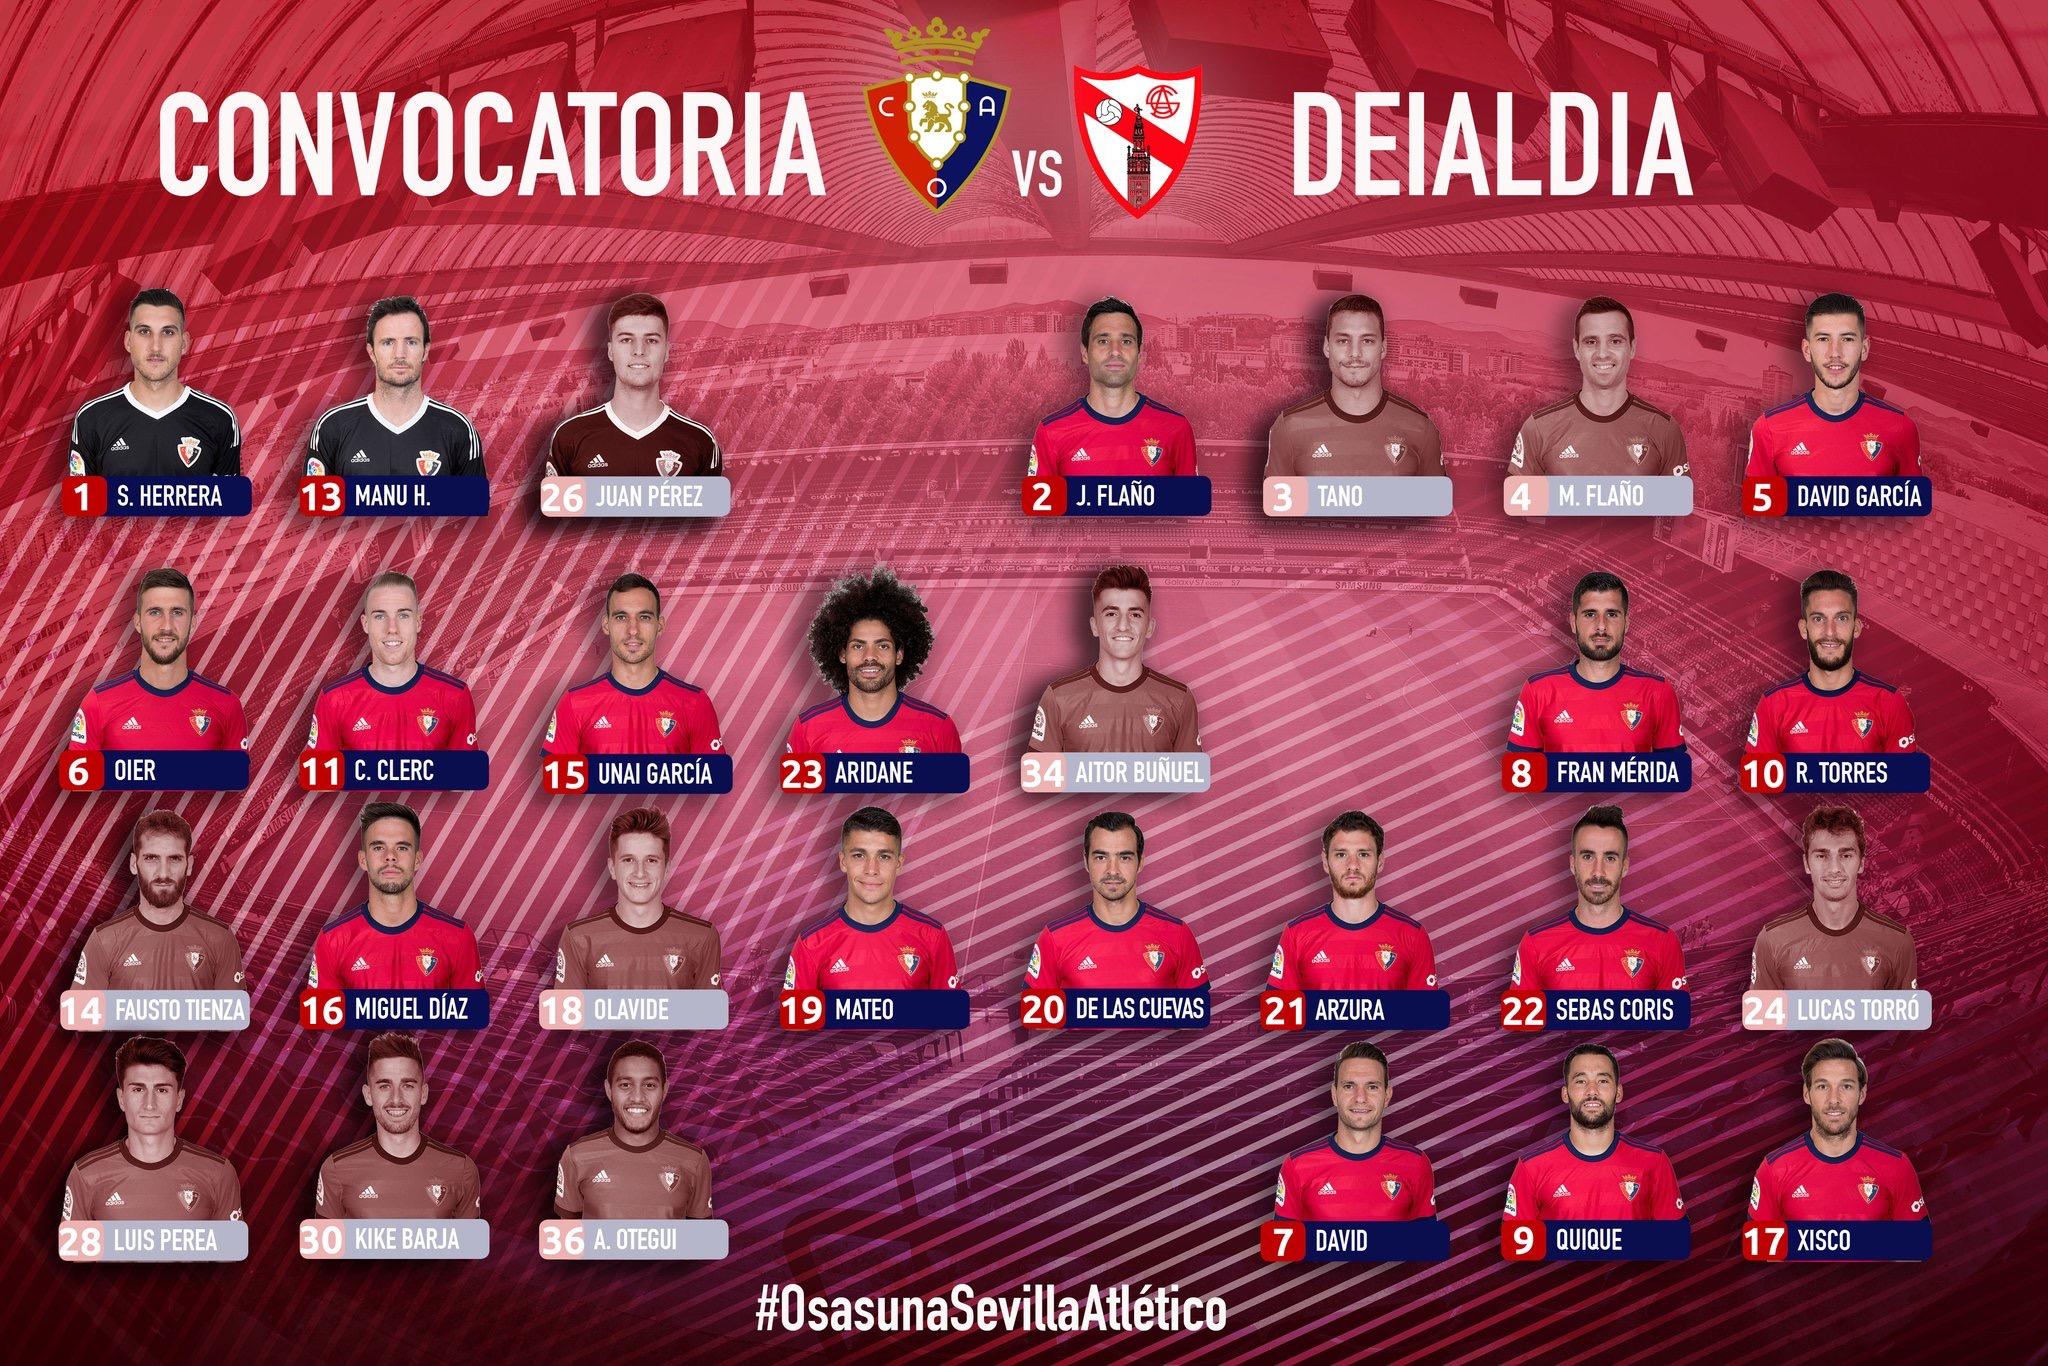 Esta es la convocatoria de Osasuna contra el Sevilla Atlético